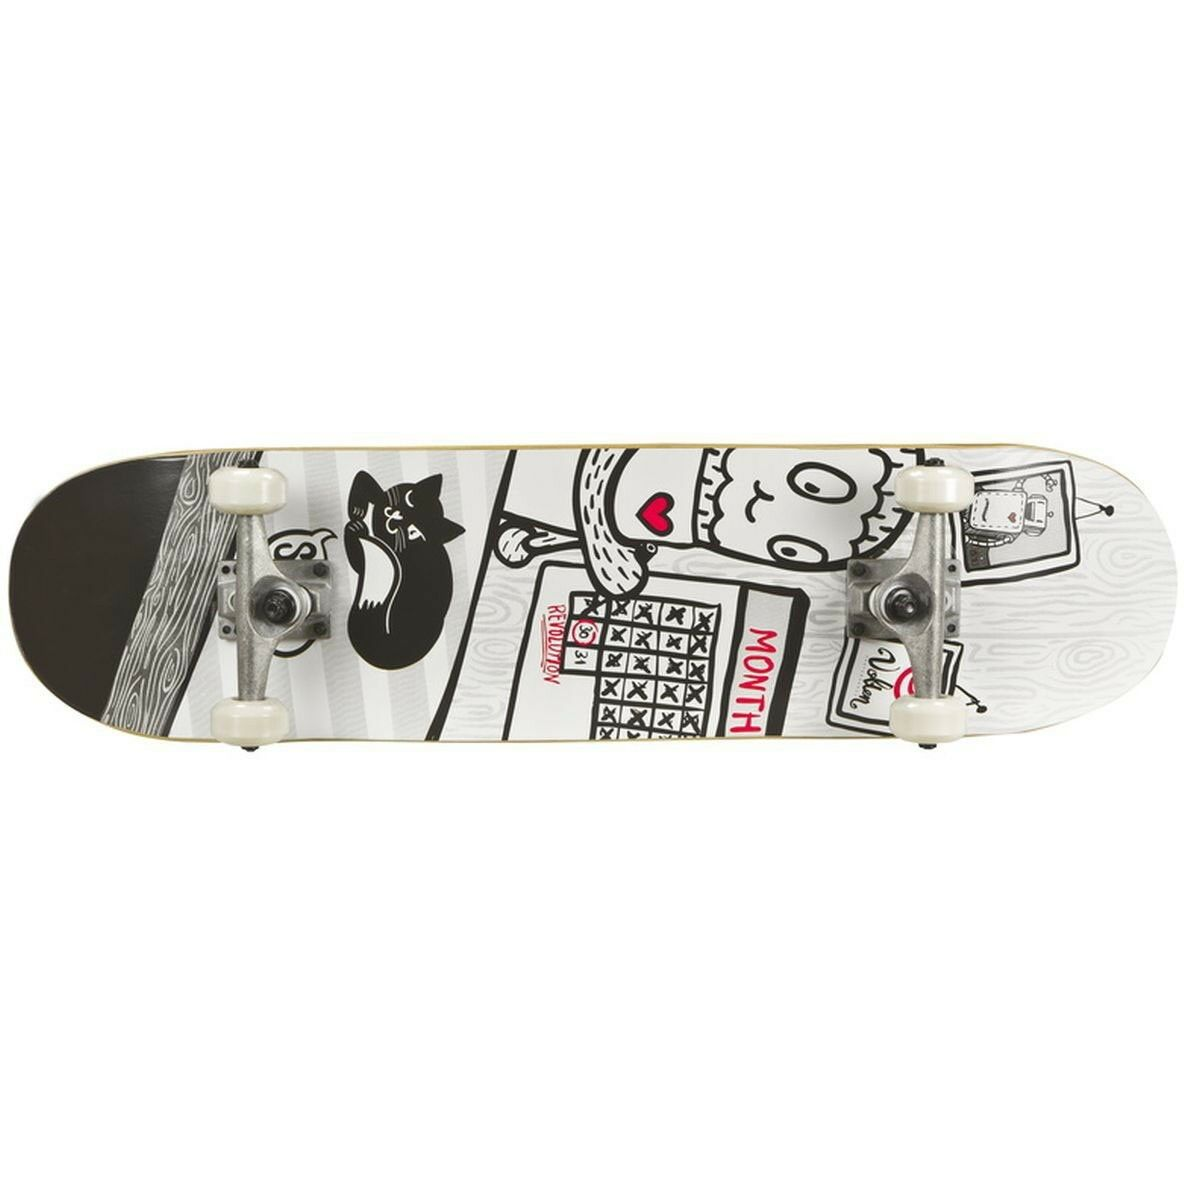 Volten Boards Shortboard Revolution Revolution Shortboard Skateboard 546c8d